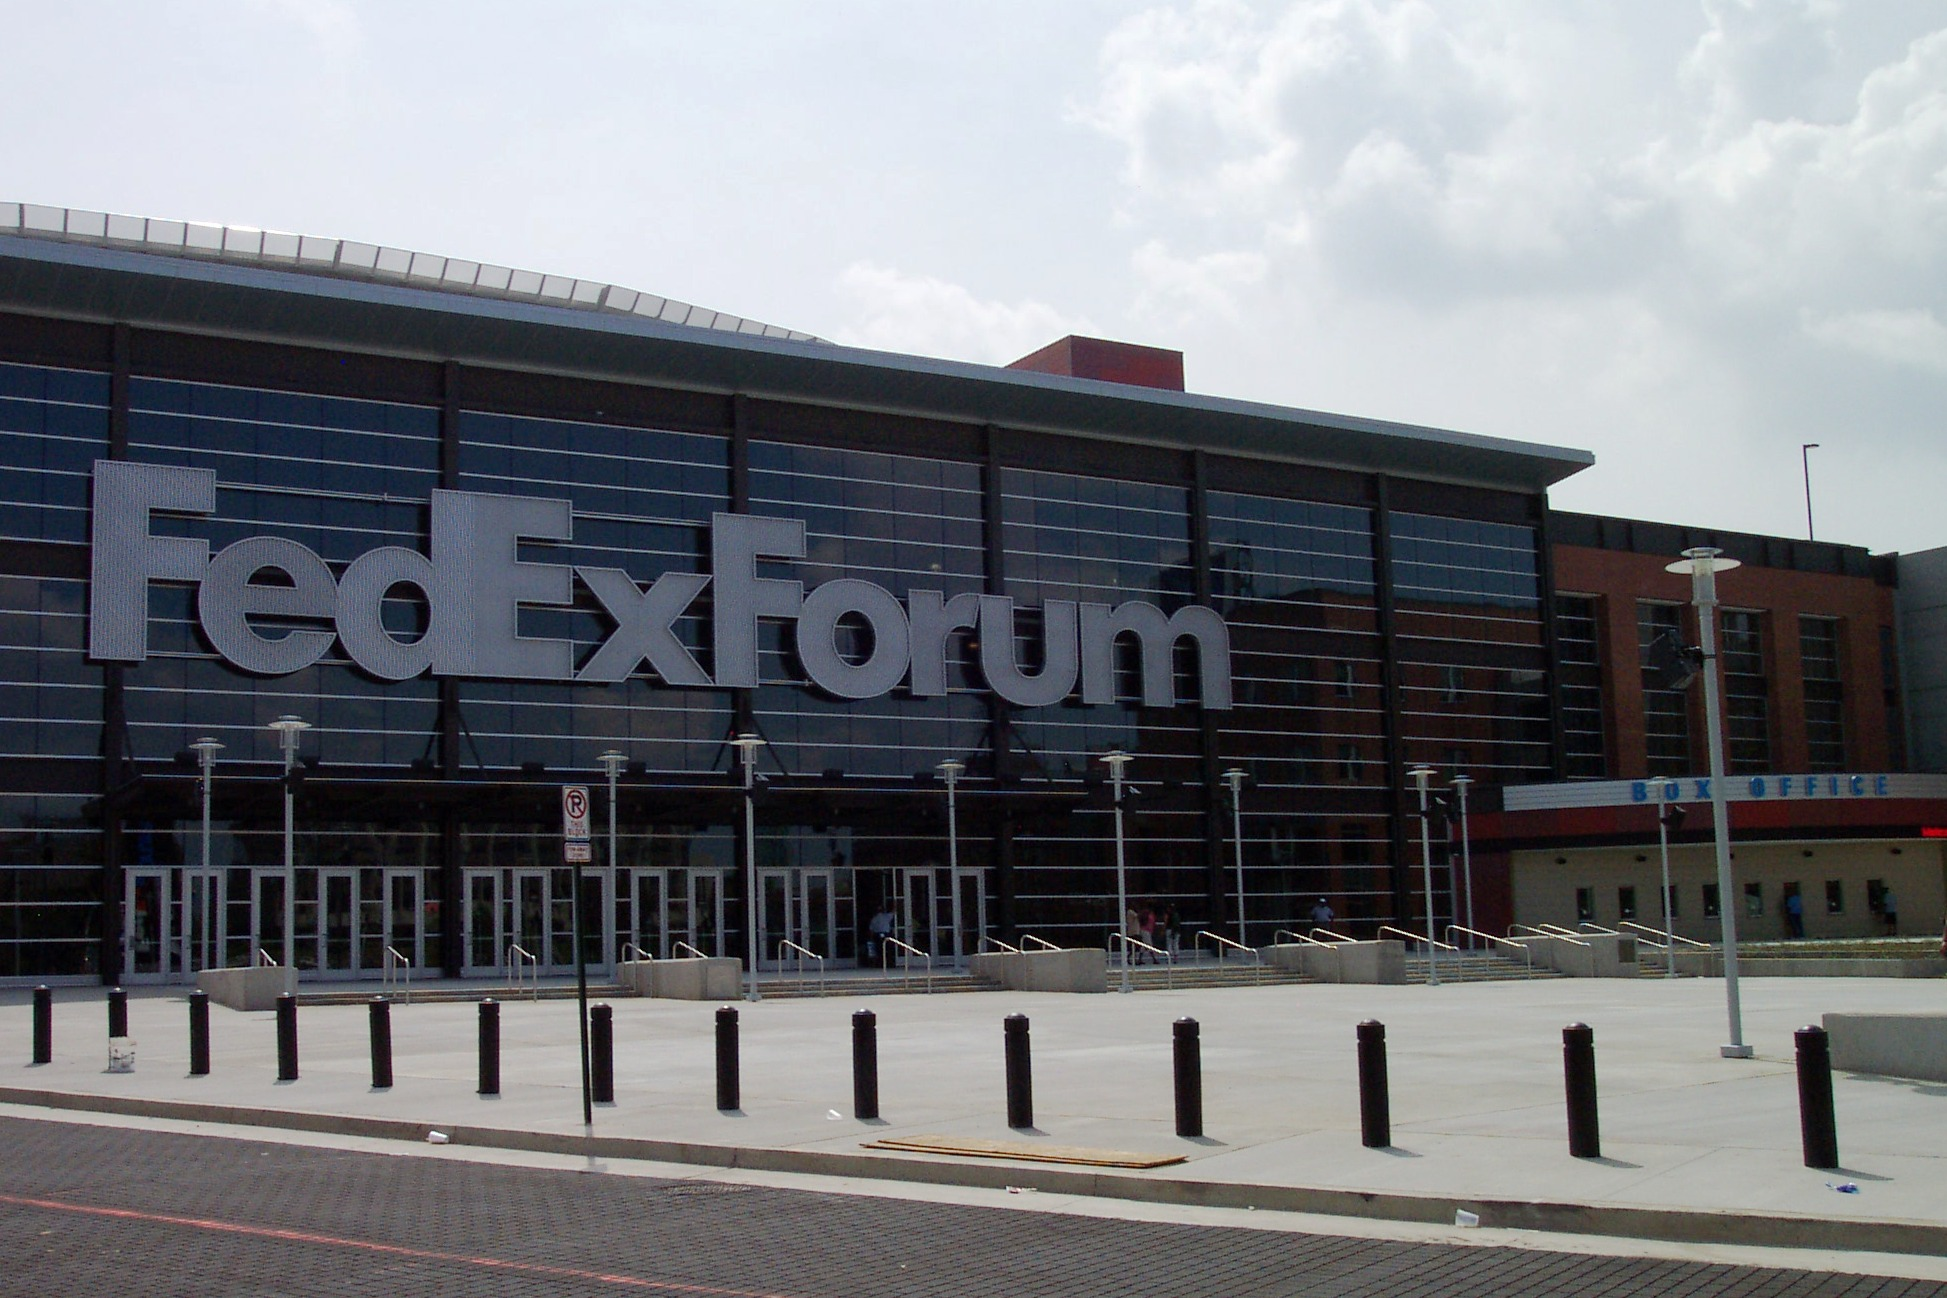 FedExForum, home of the Memphis Grizzlies